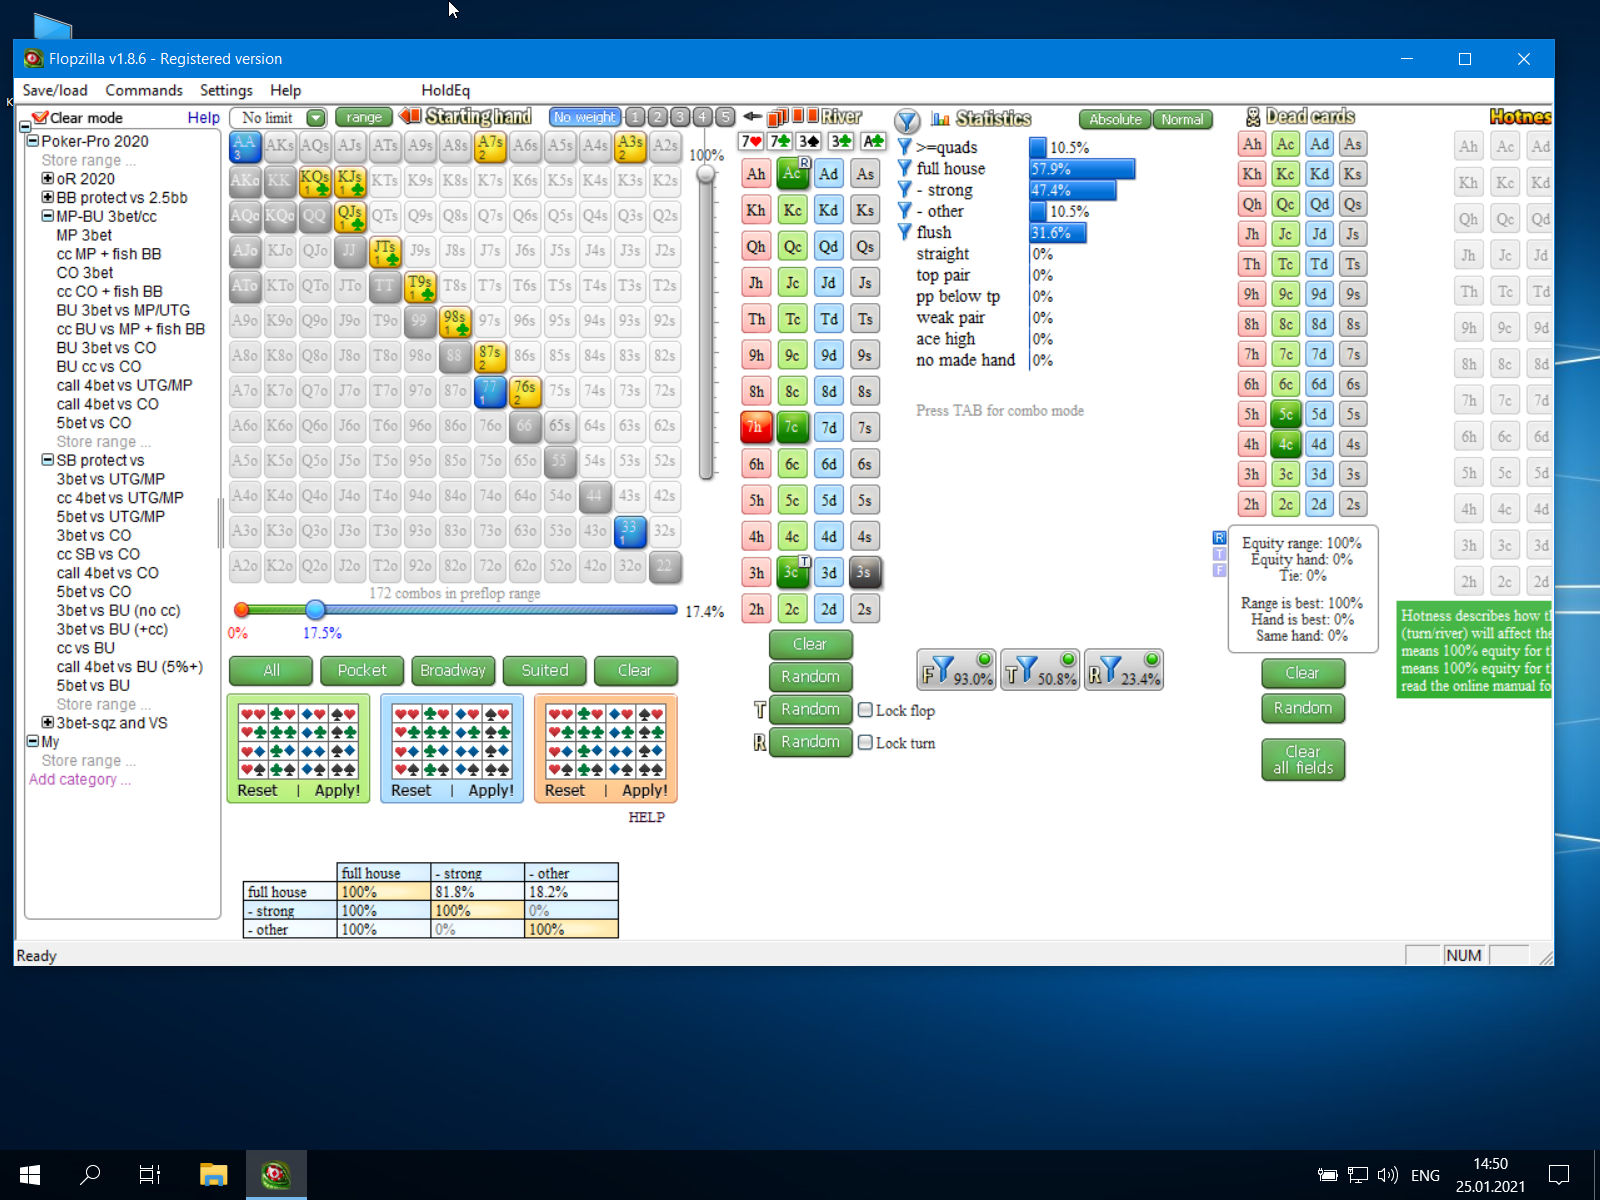 virtualboxwin-10250120211450081611575439.png